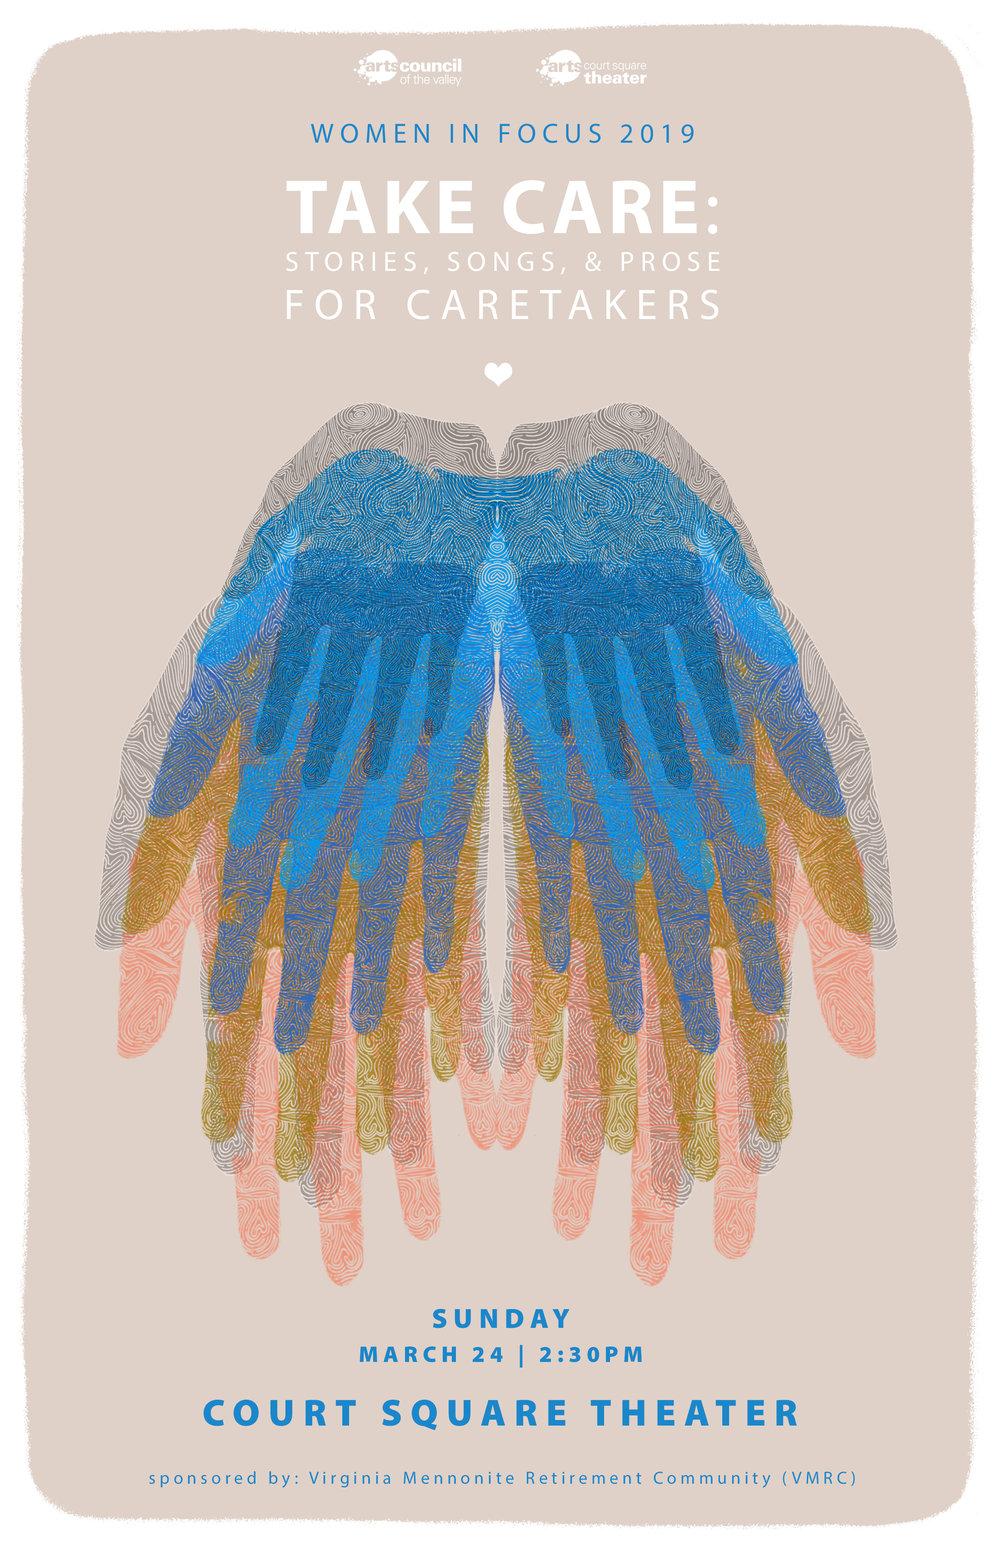 Poster artwork by Lynda Bostrom